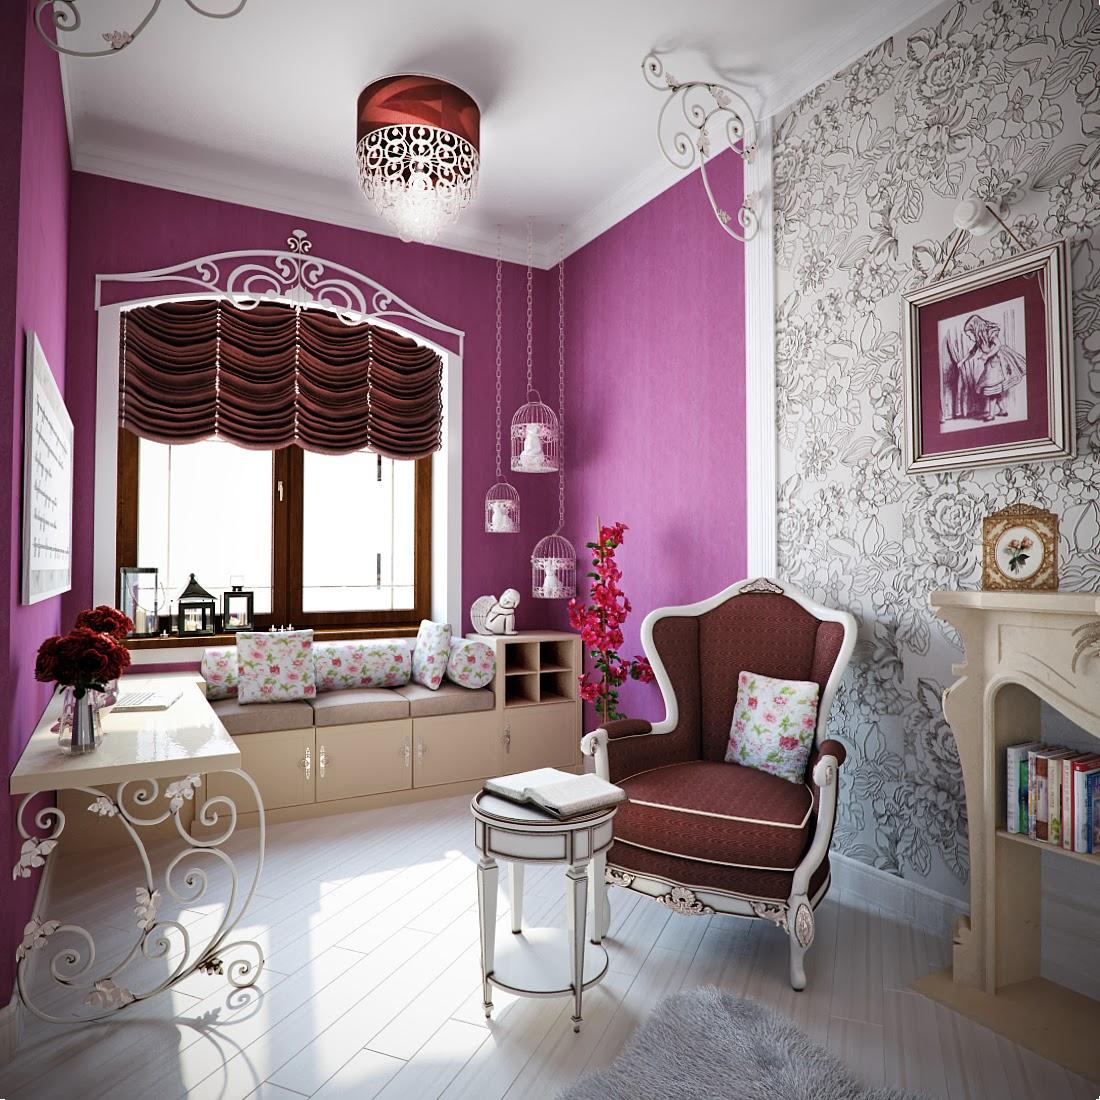 Svetlana Roma Design: Designer - Colour Of The Year 2014 In Interior Design's weekdays. Pantone Color of the ...